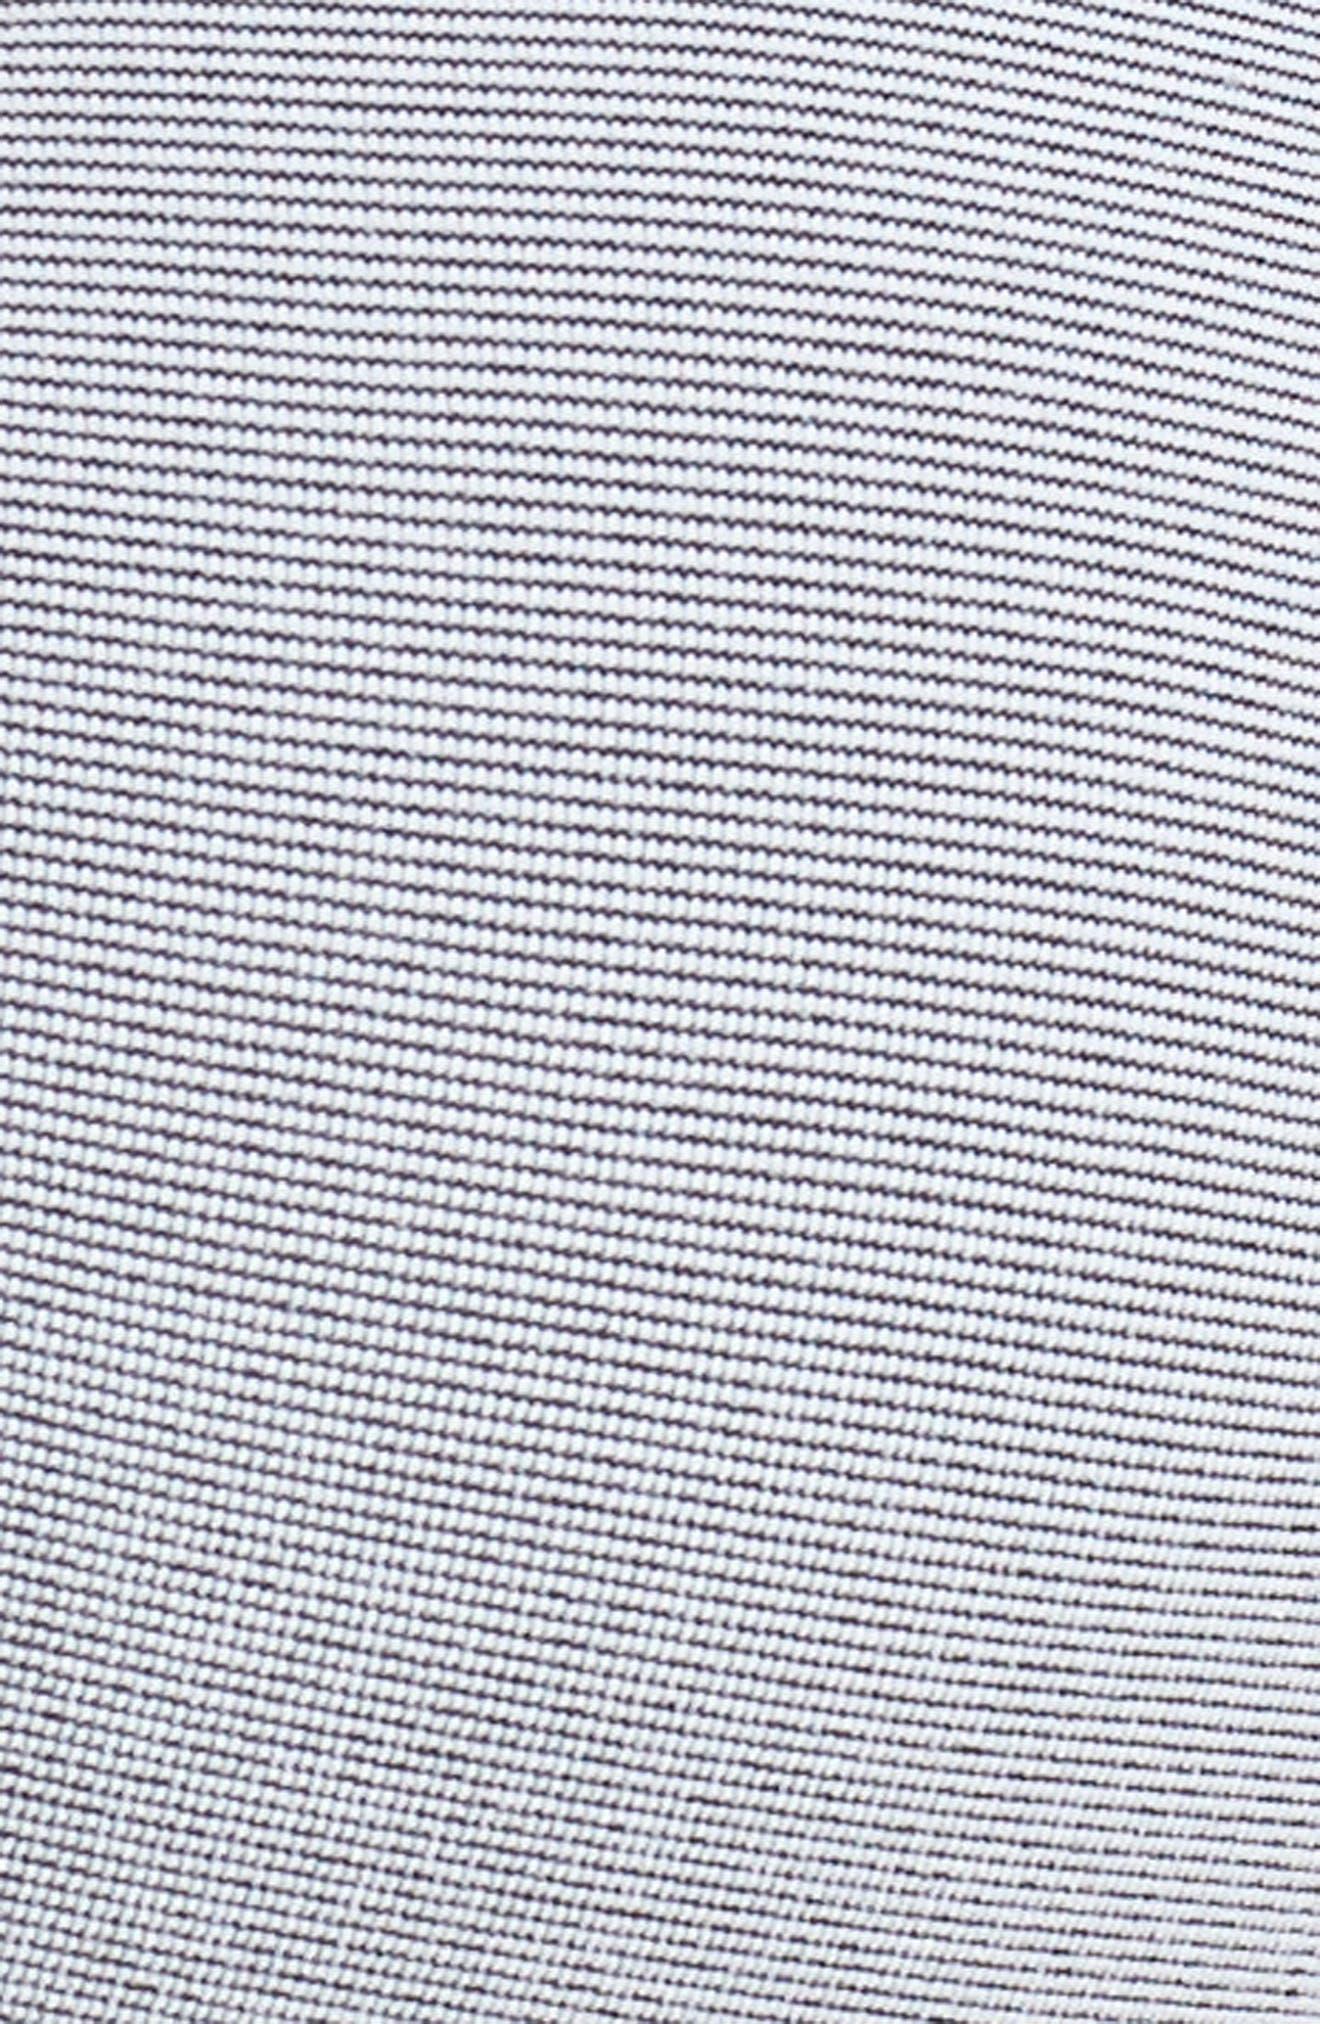 Seamless Contour Bralette,                             Alternate thumbnail 7, color,                             BLACK WHITE FEEDER STRIPE